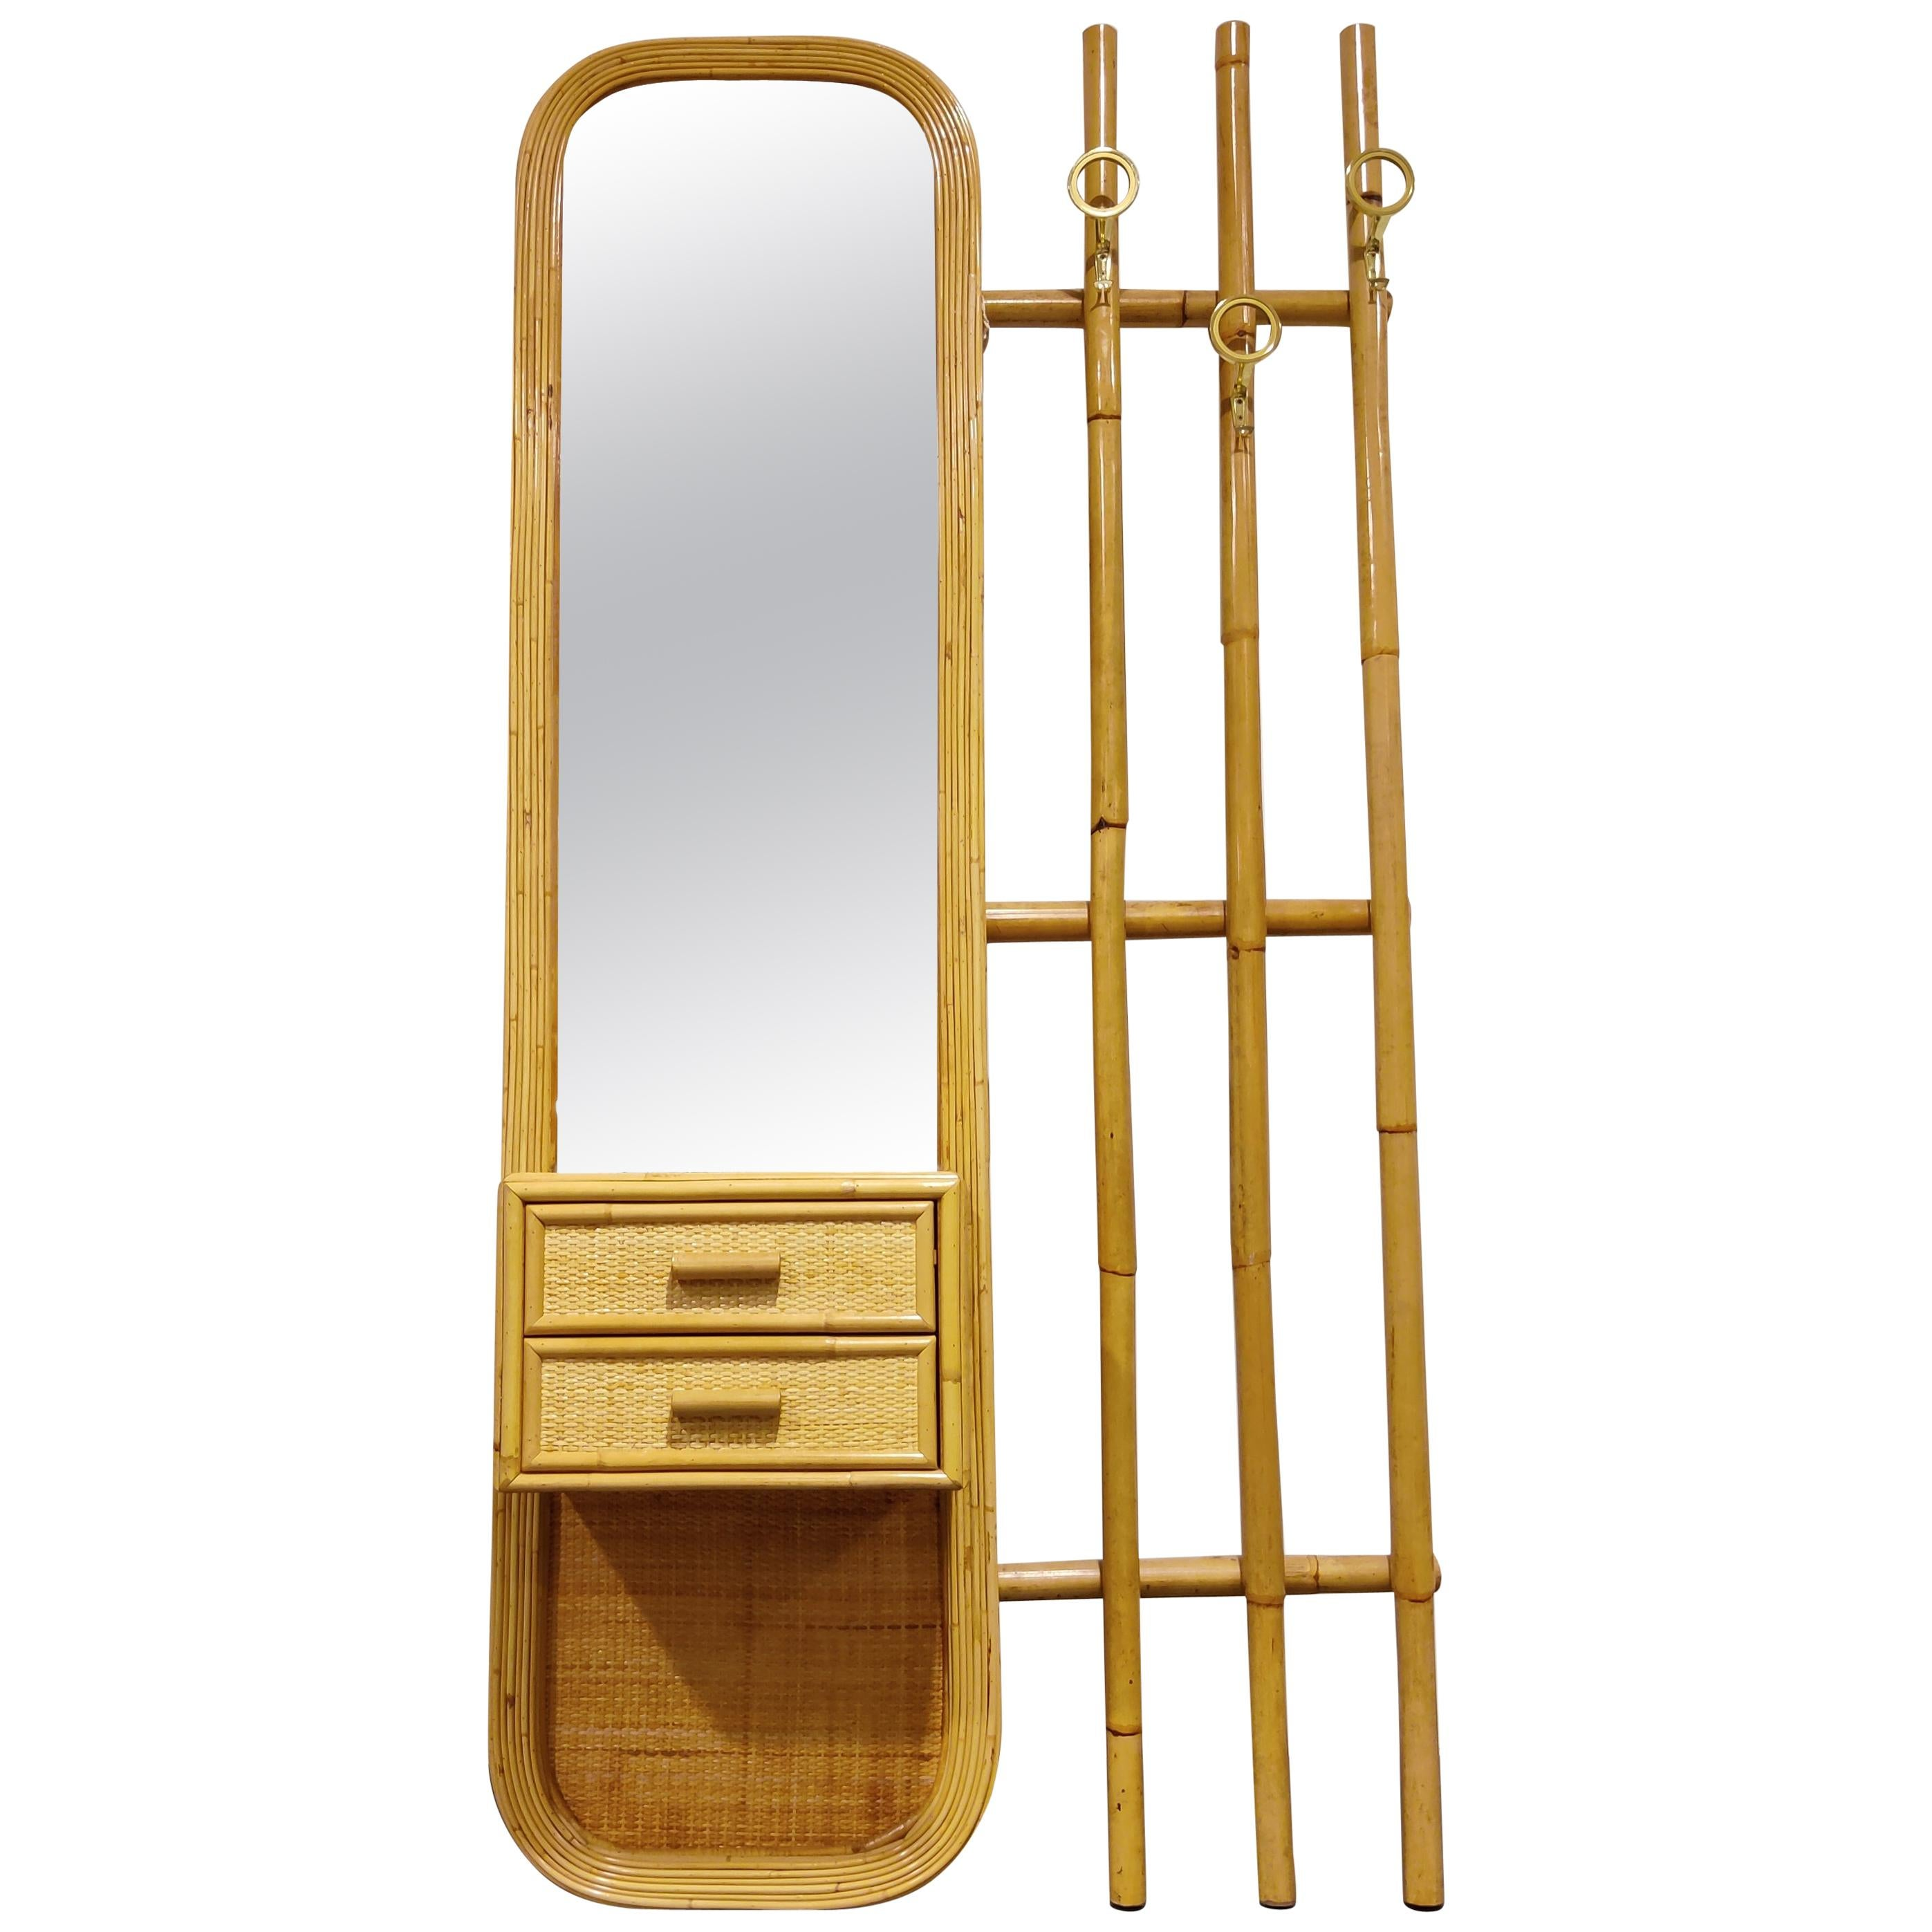 Midcentury Bamboo Coat Rack, 1960s